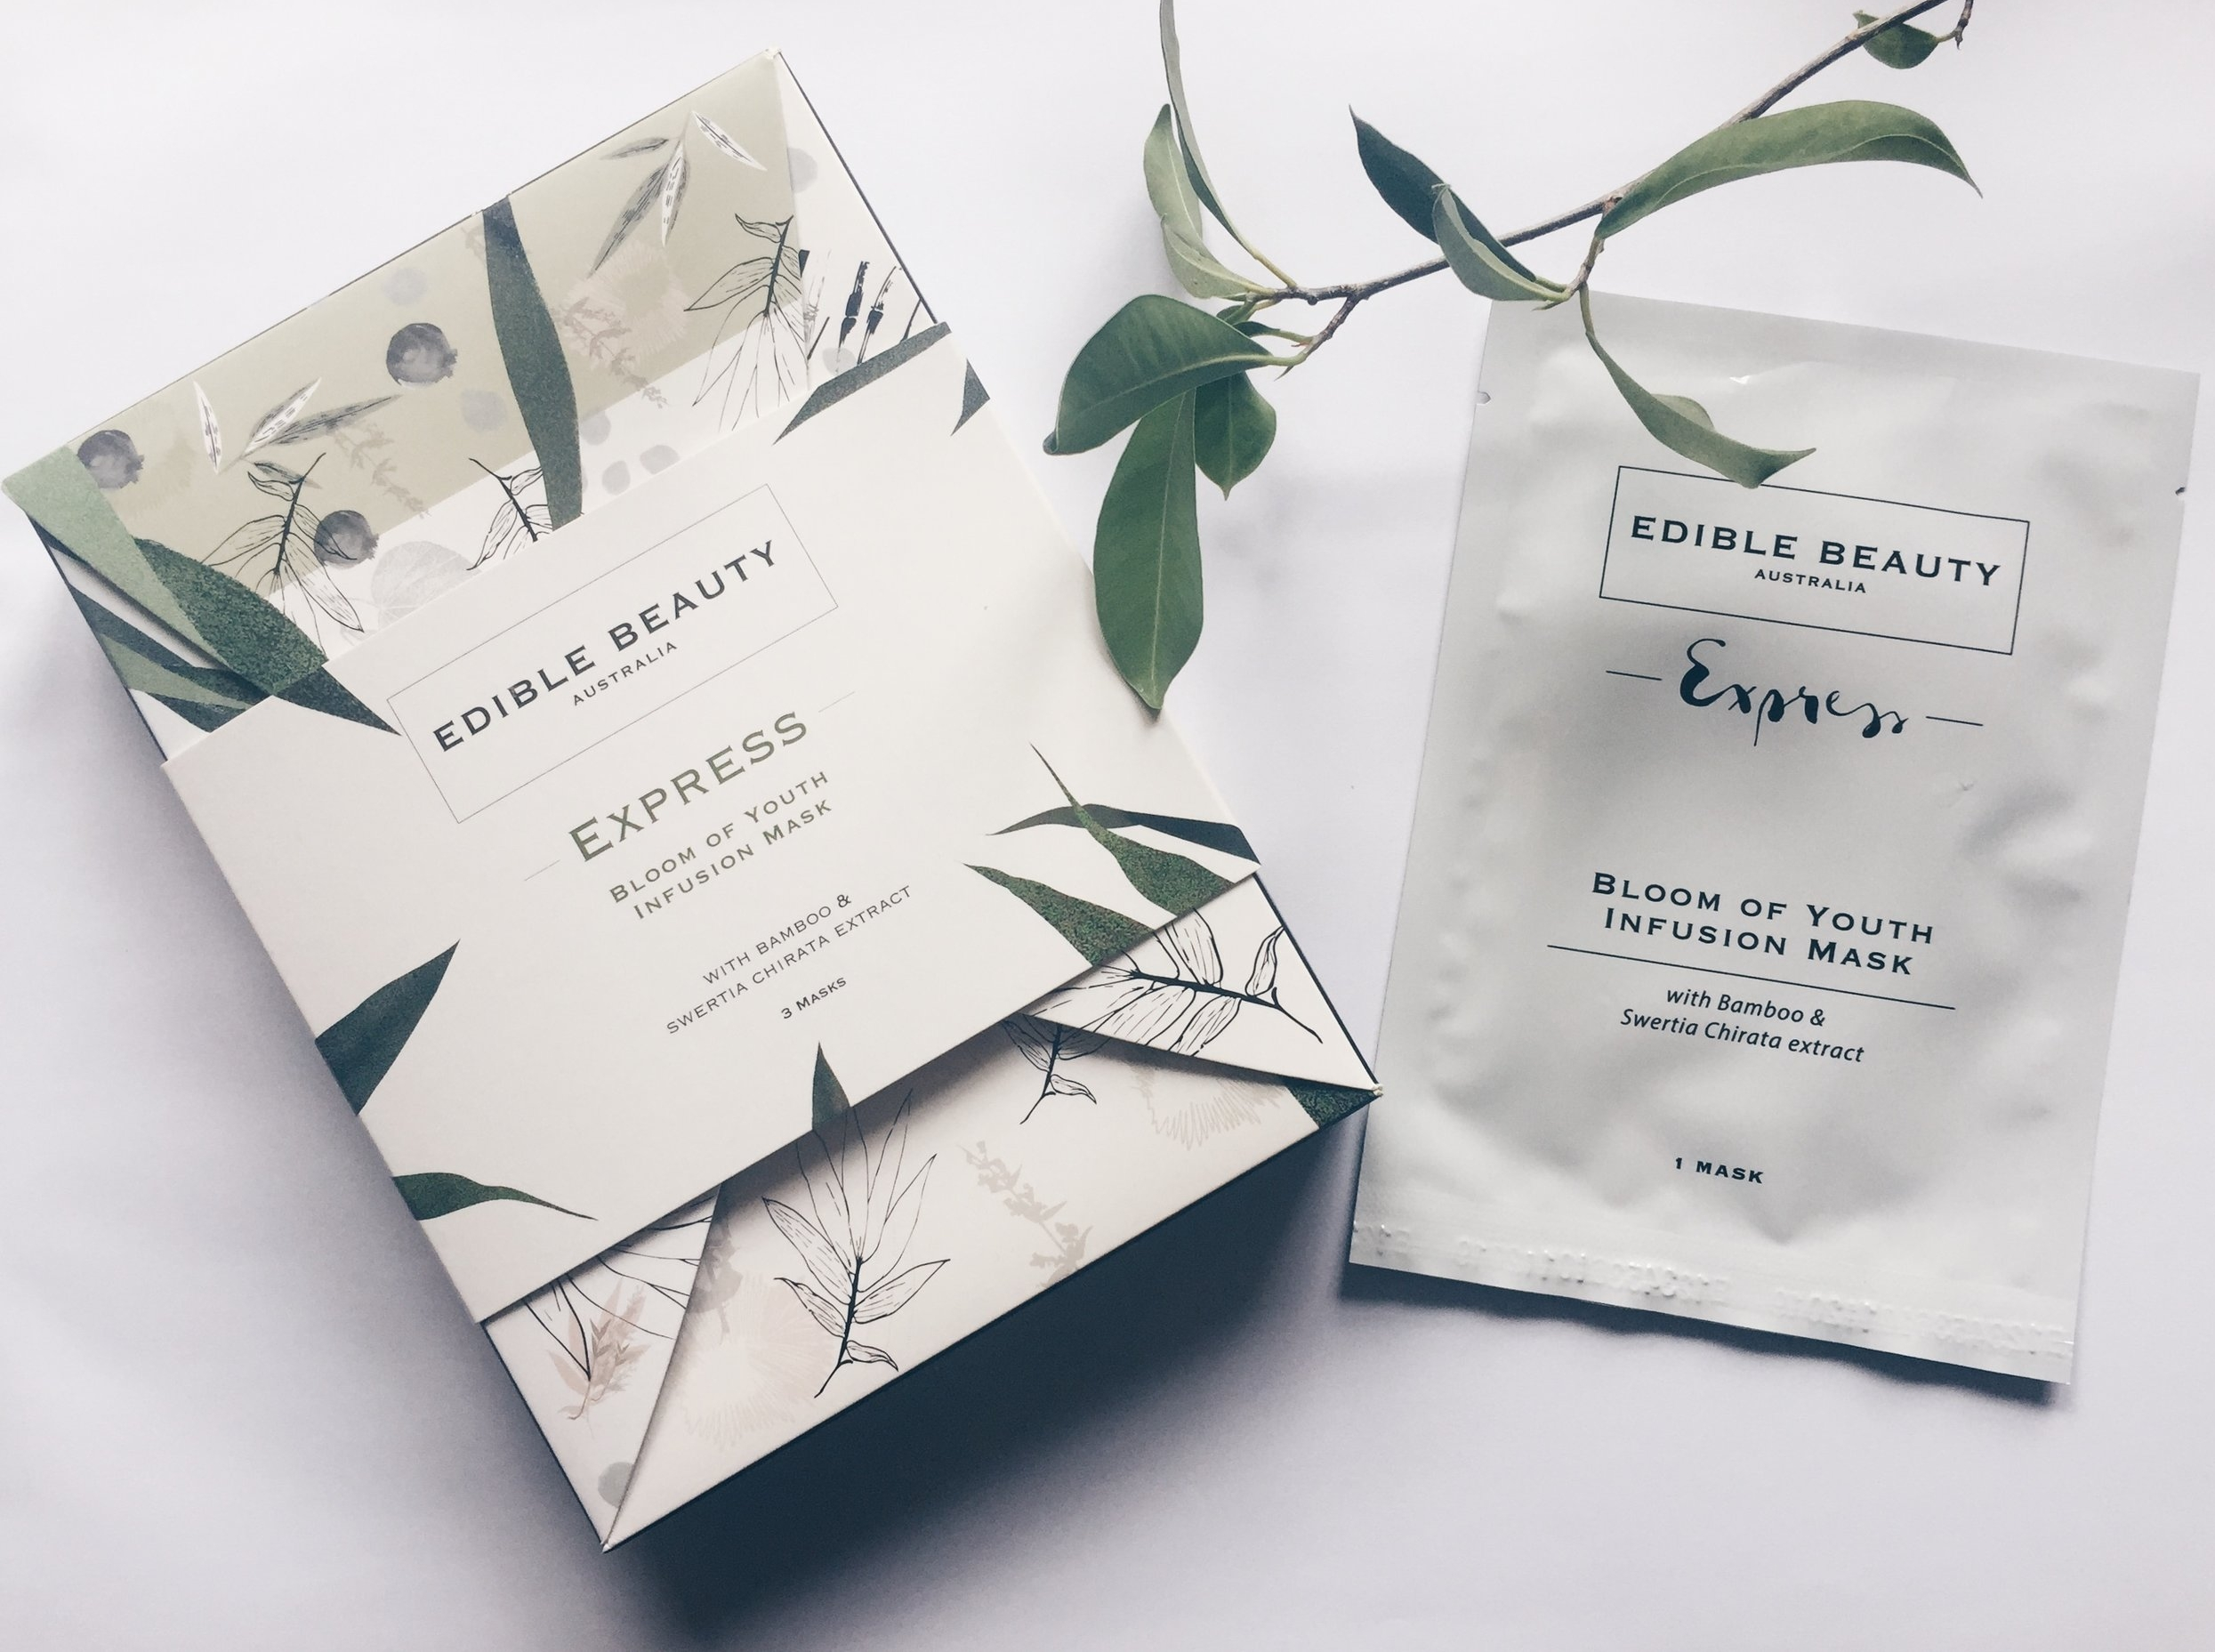 Edible Beauty Face Mask Review Vegan Organic Face Mask